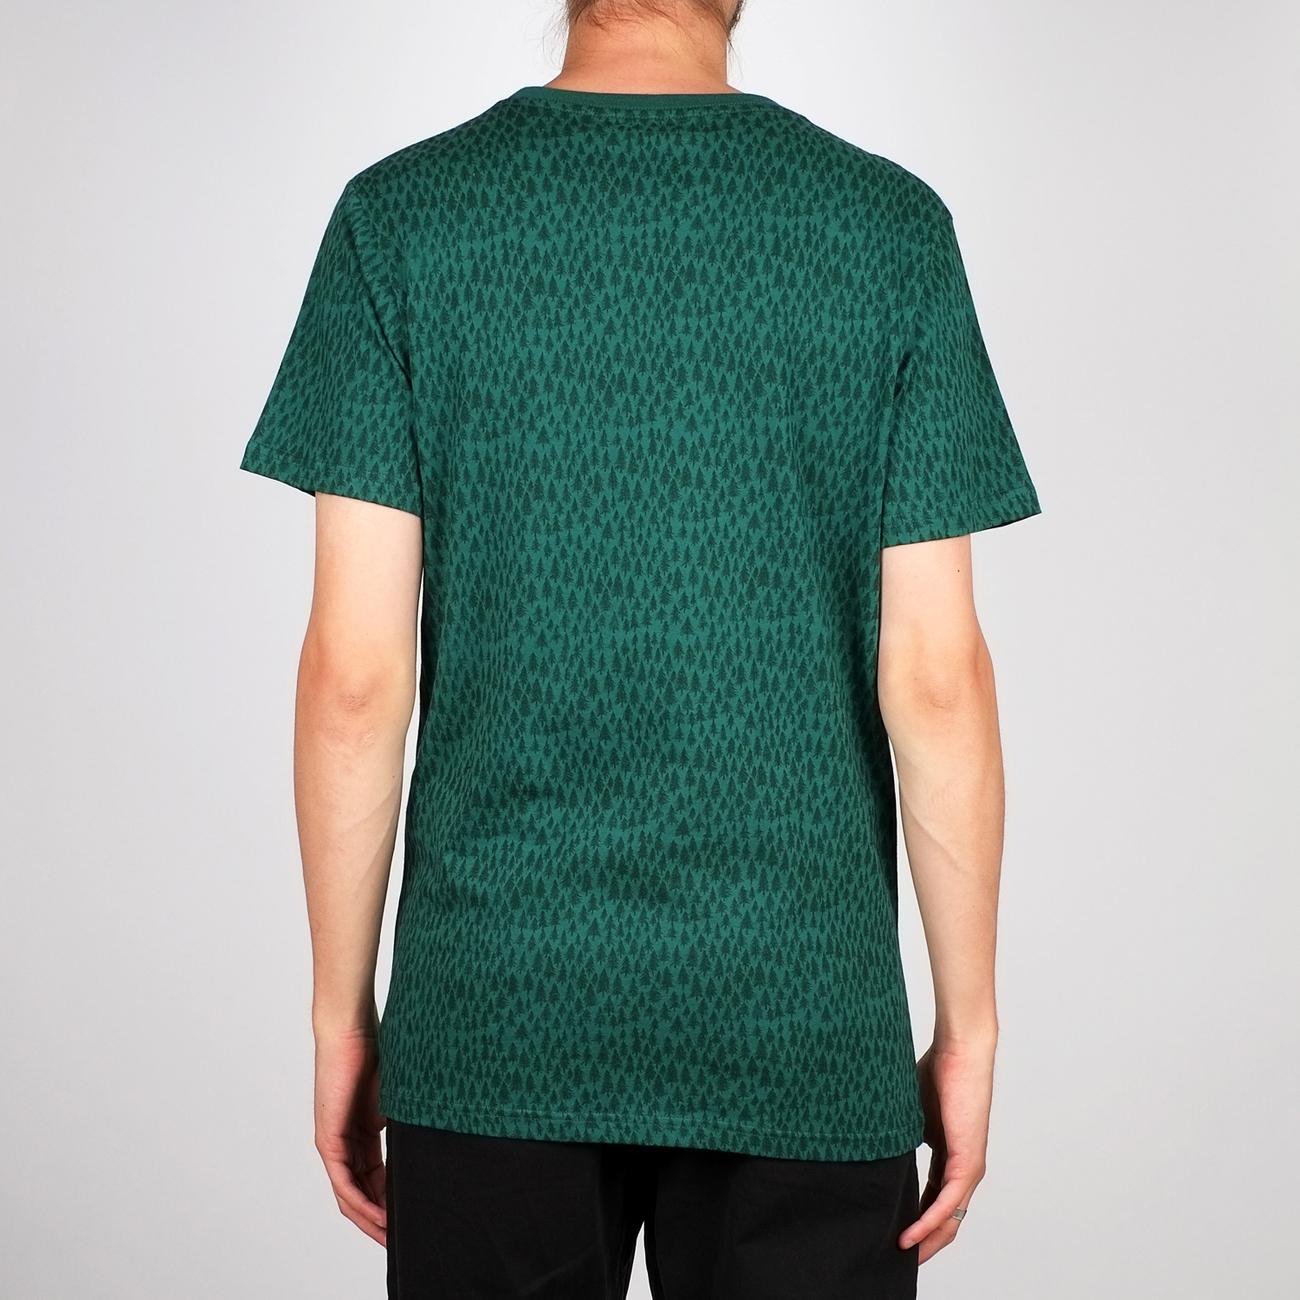 T-shirt Stockholm Tree Pattern